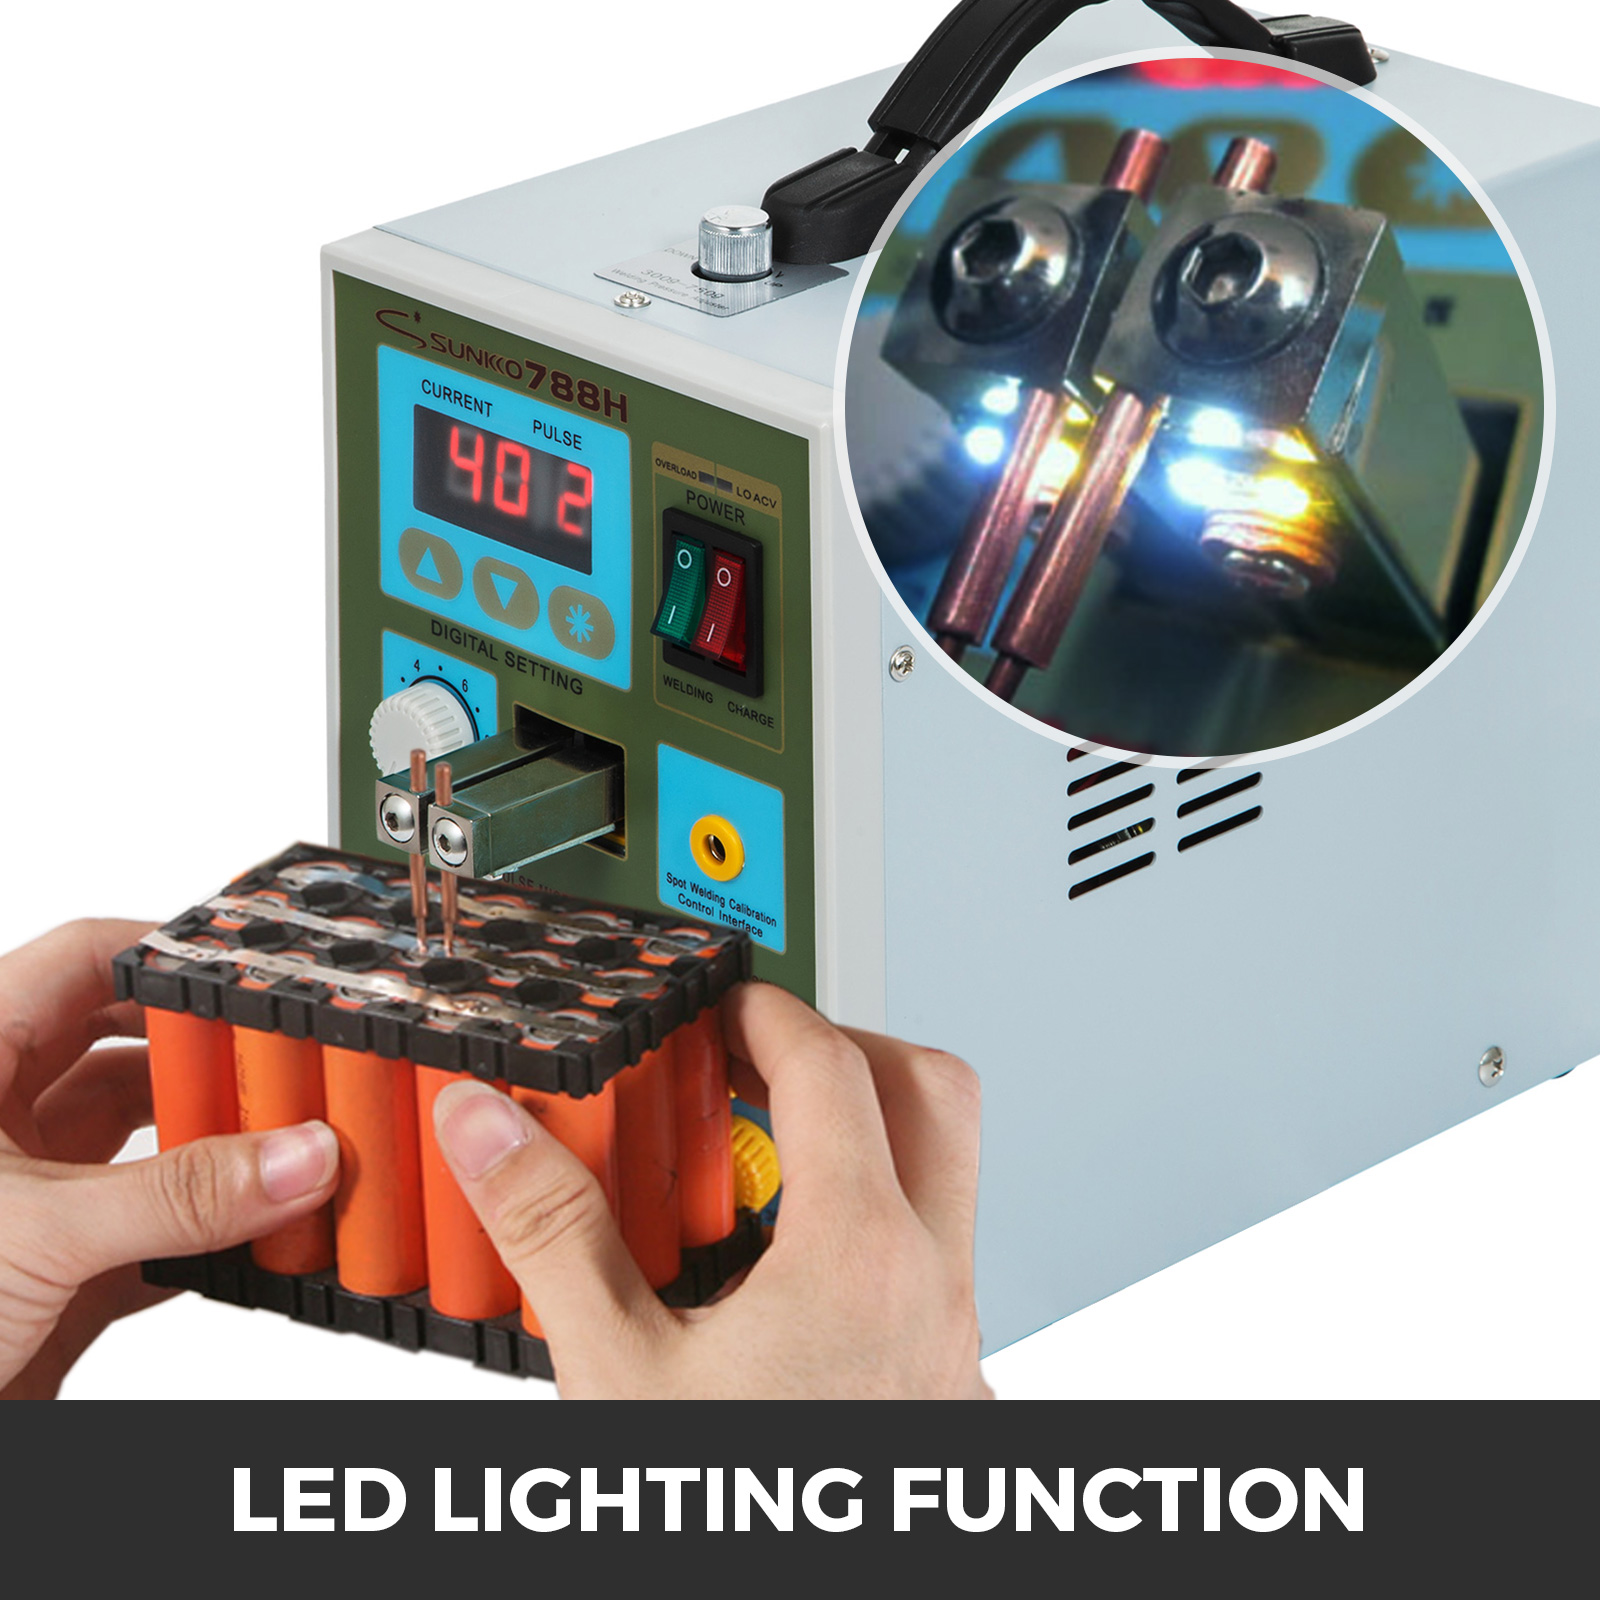 788H 2in1 LED Pulse Punktschweiß 220V 50-60Hz gerät Spot Welder Battery Charger